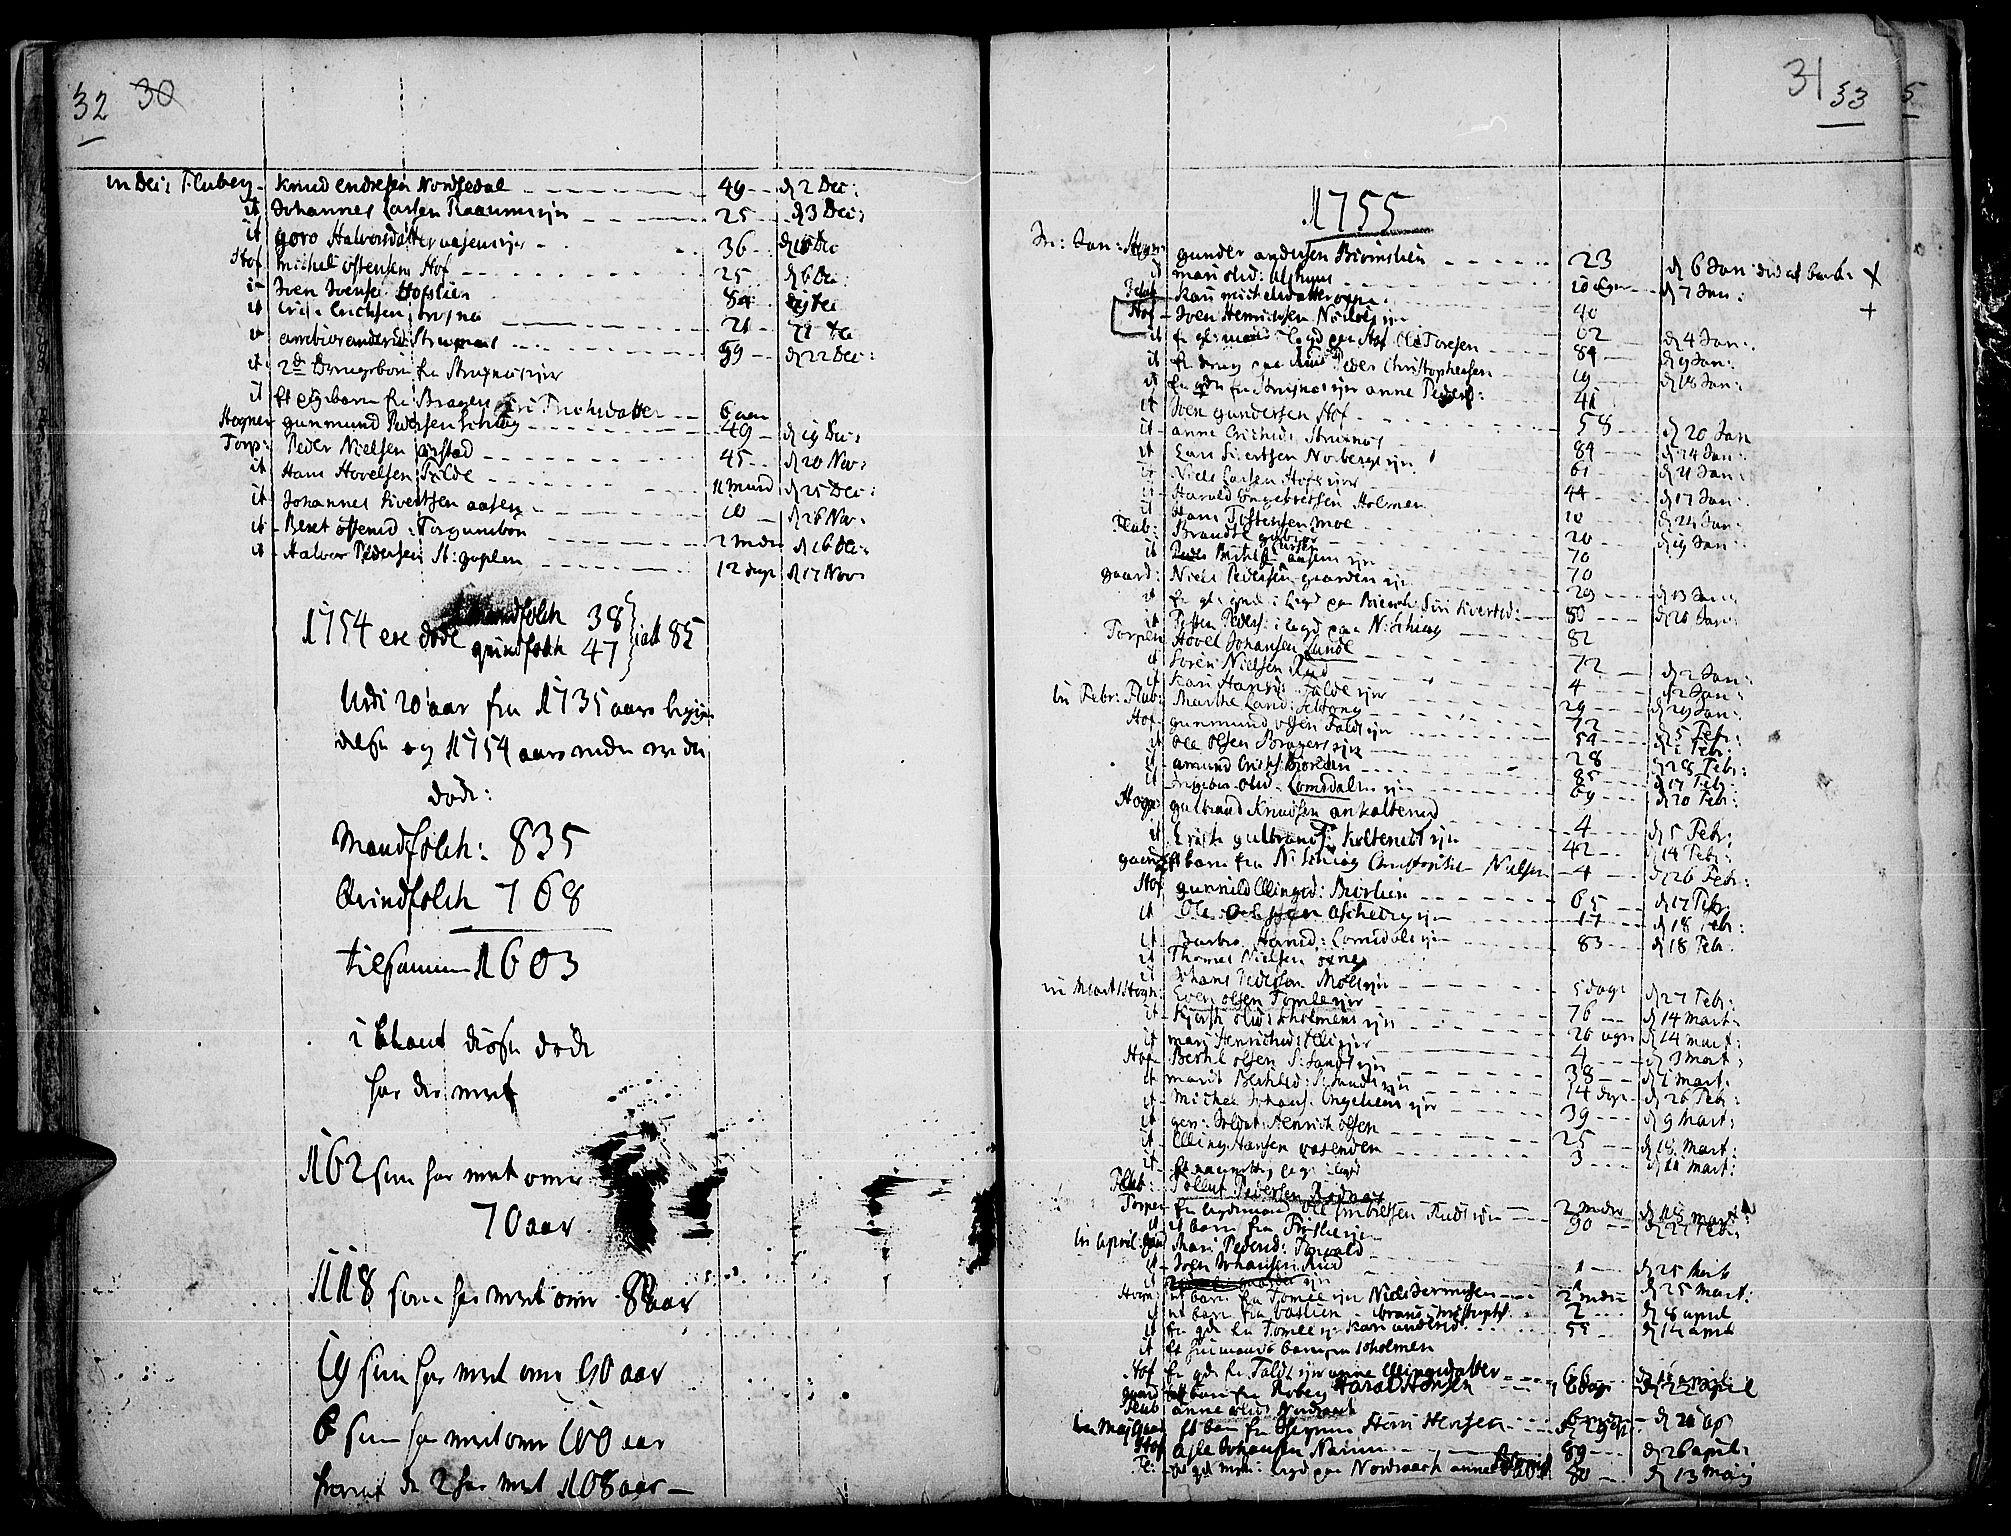 SAH, Land prestekontor, Ministerialbok nr. 4, 1733-1764, s. 32-33